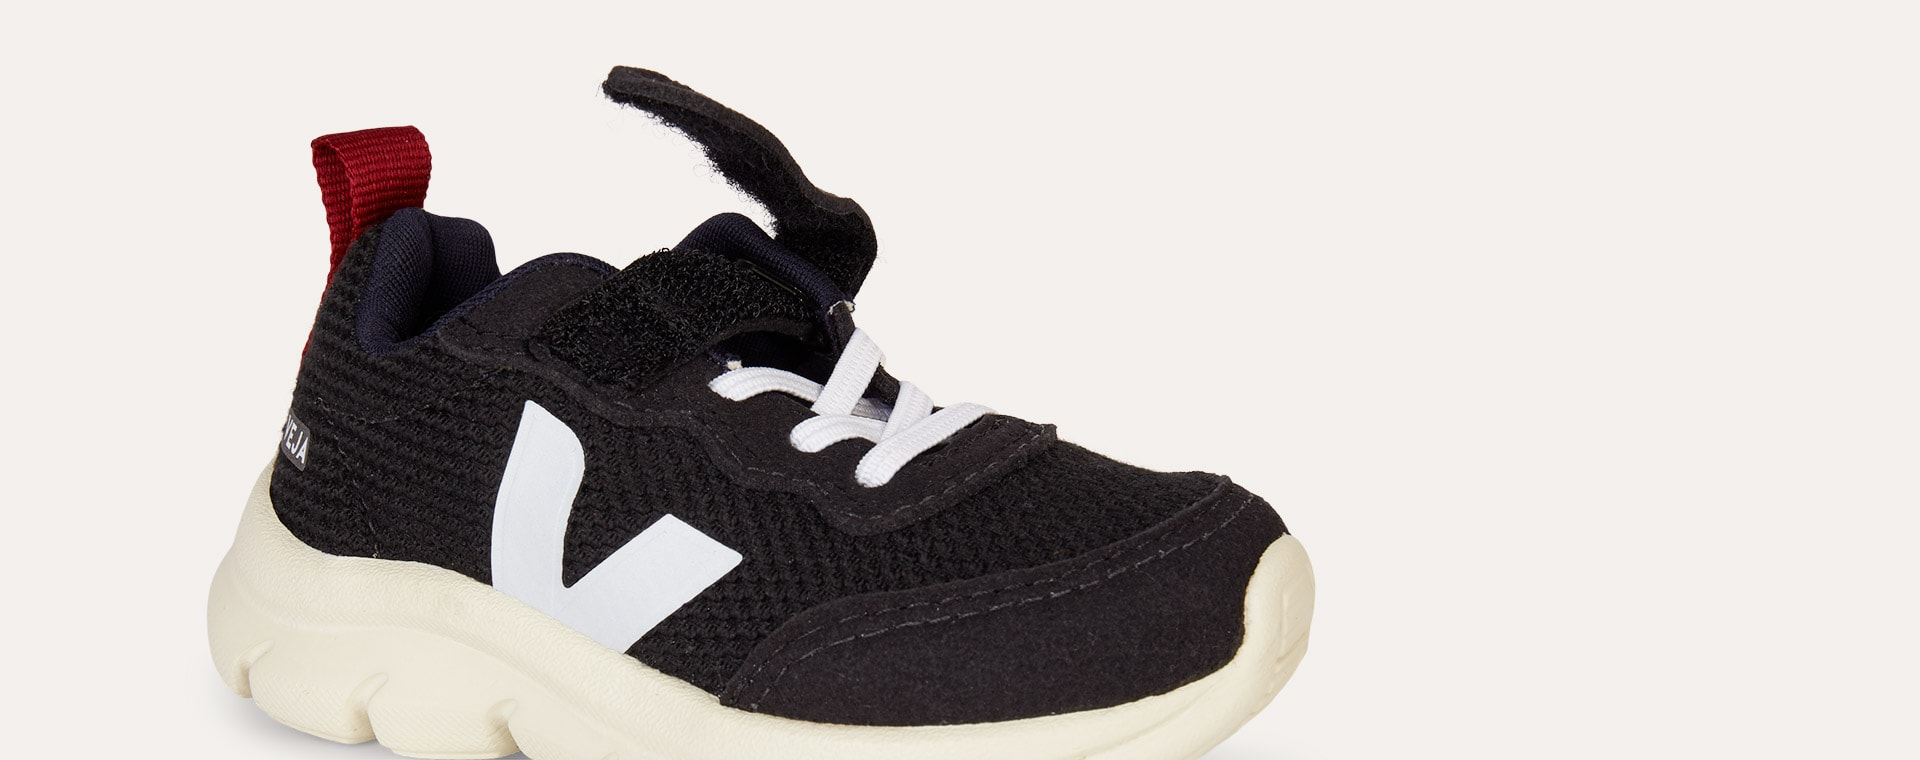 Black White Veja Gorilla Trainer